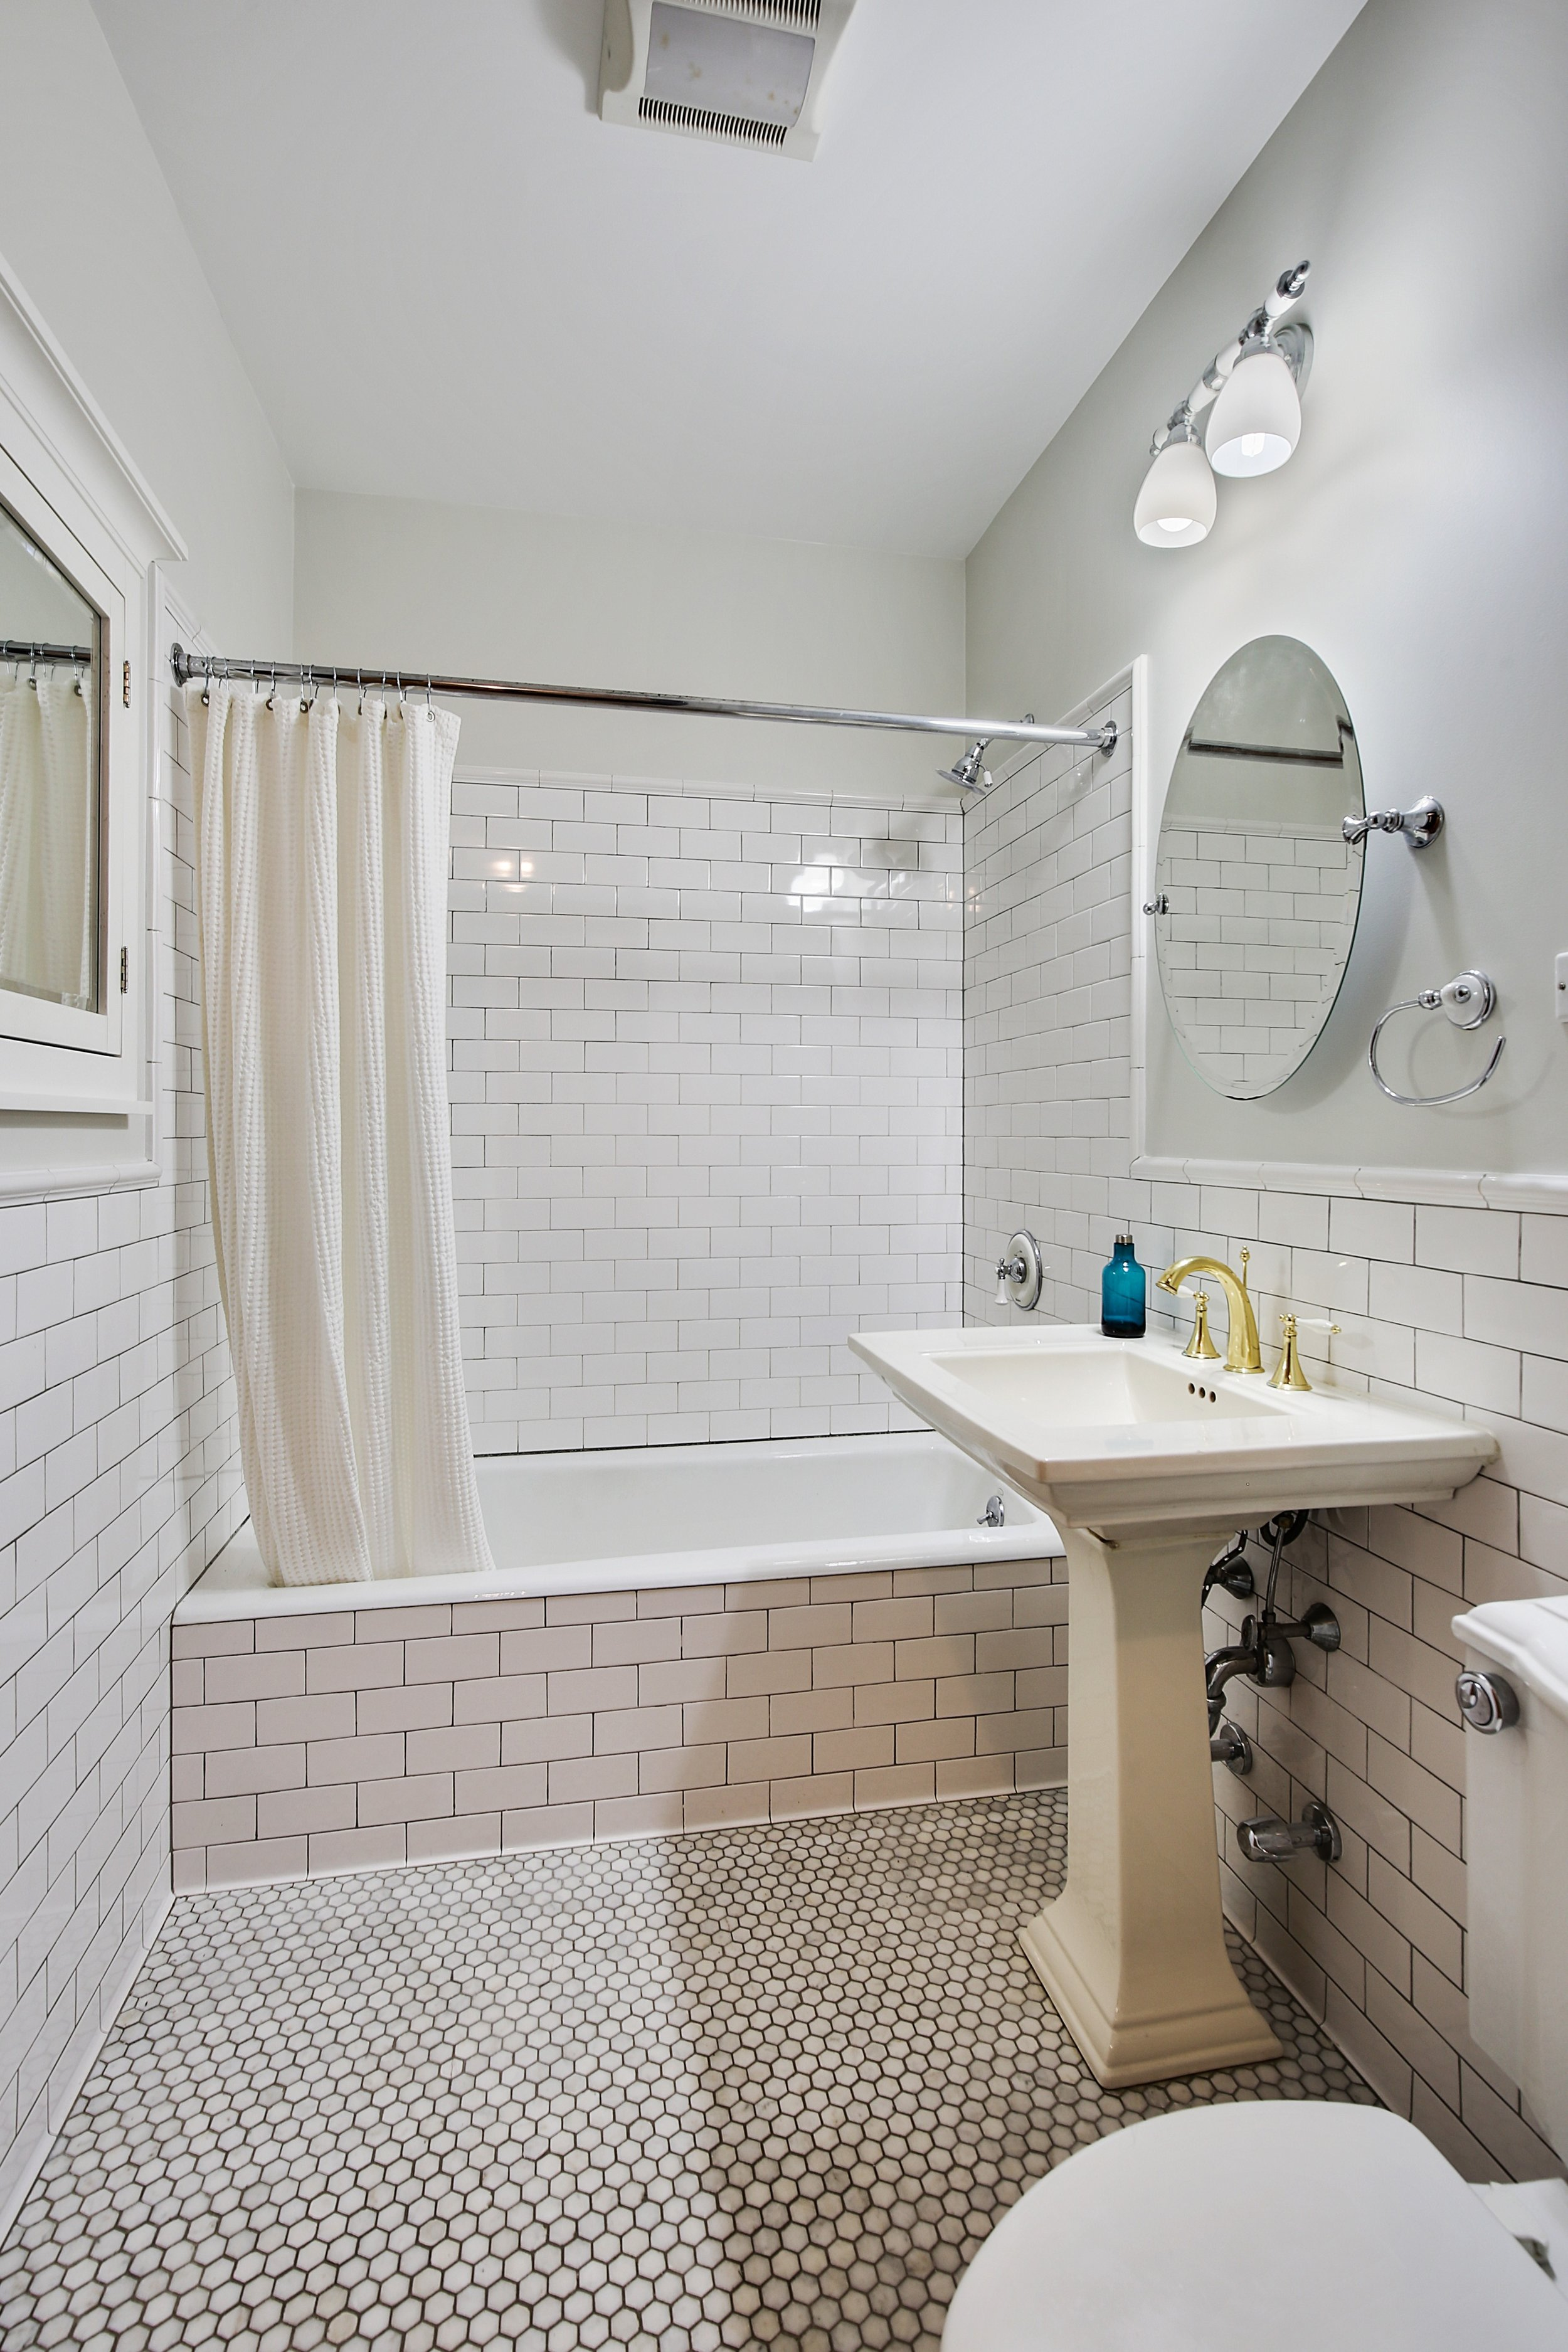 6_168WashingtonPark_2_8_Bathroom_HiRes.jpg